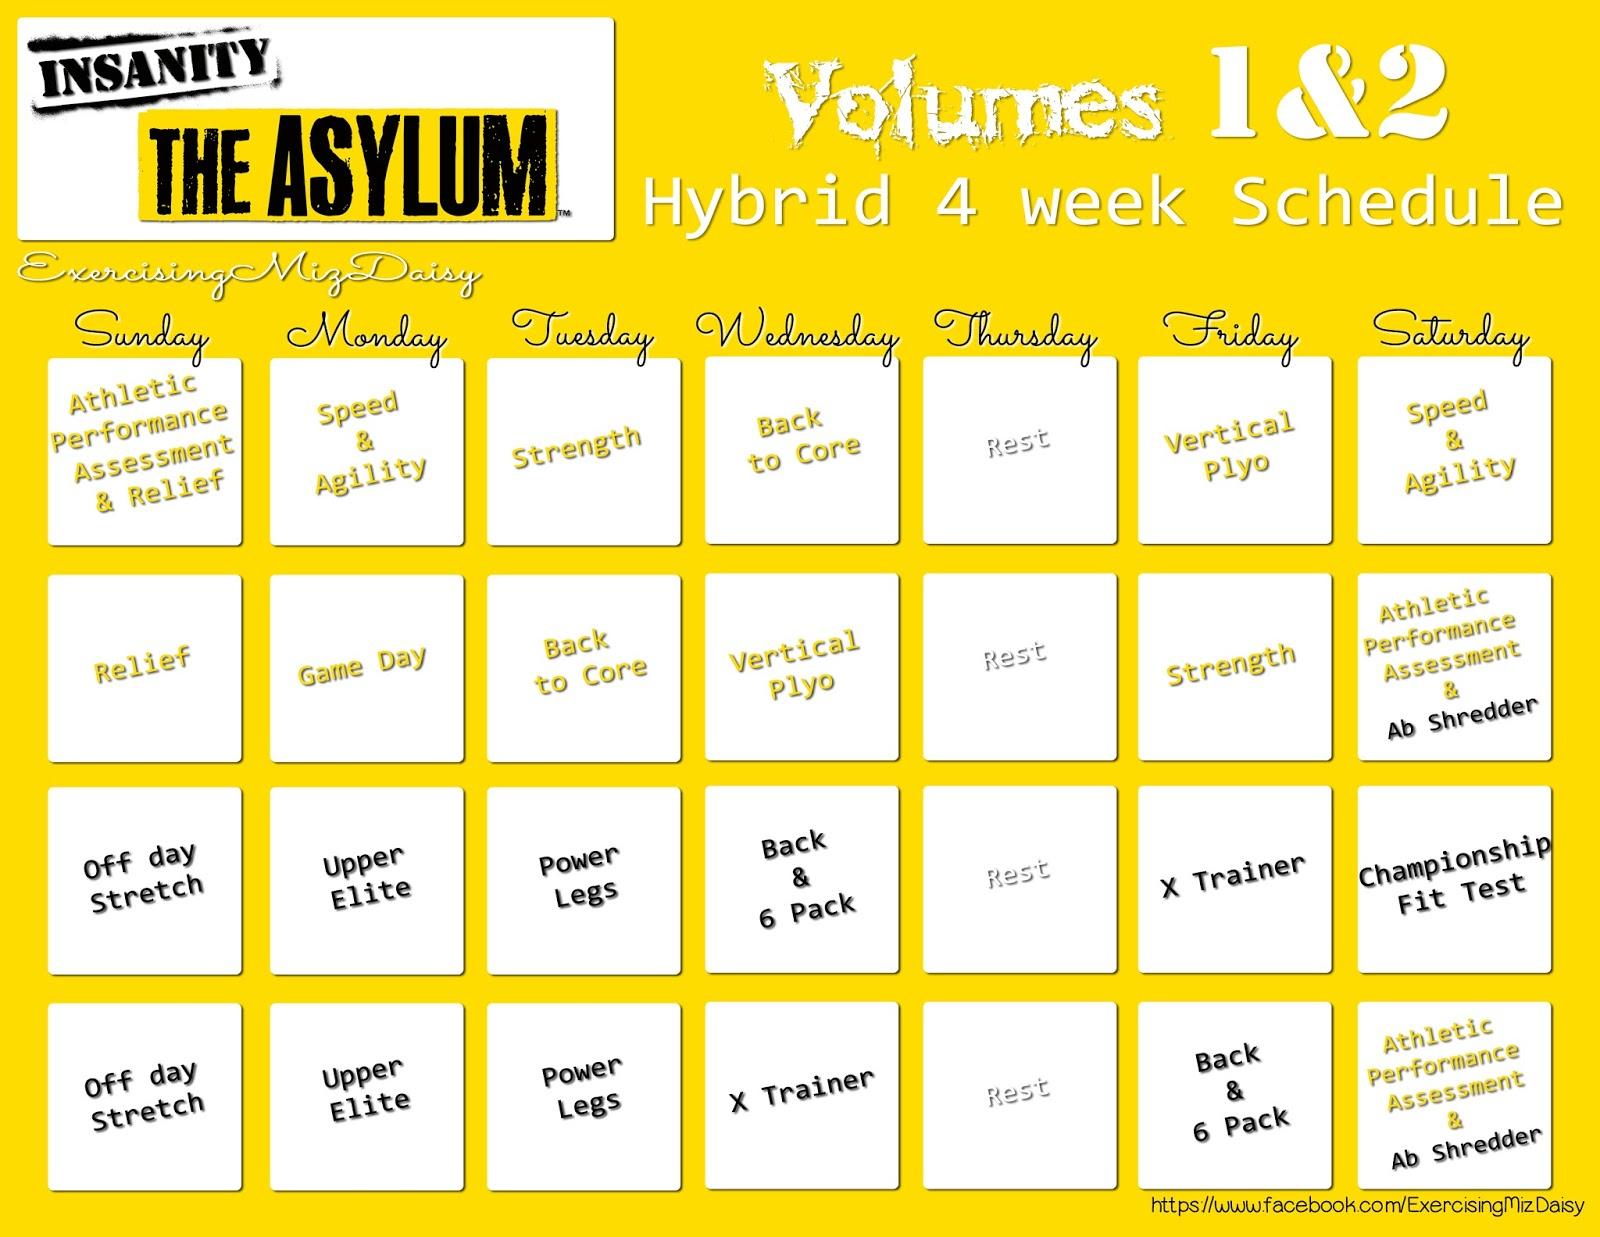 Blogging Miz Daisy: Insanity Asylum Review for Shaun T Hybrid Calendar